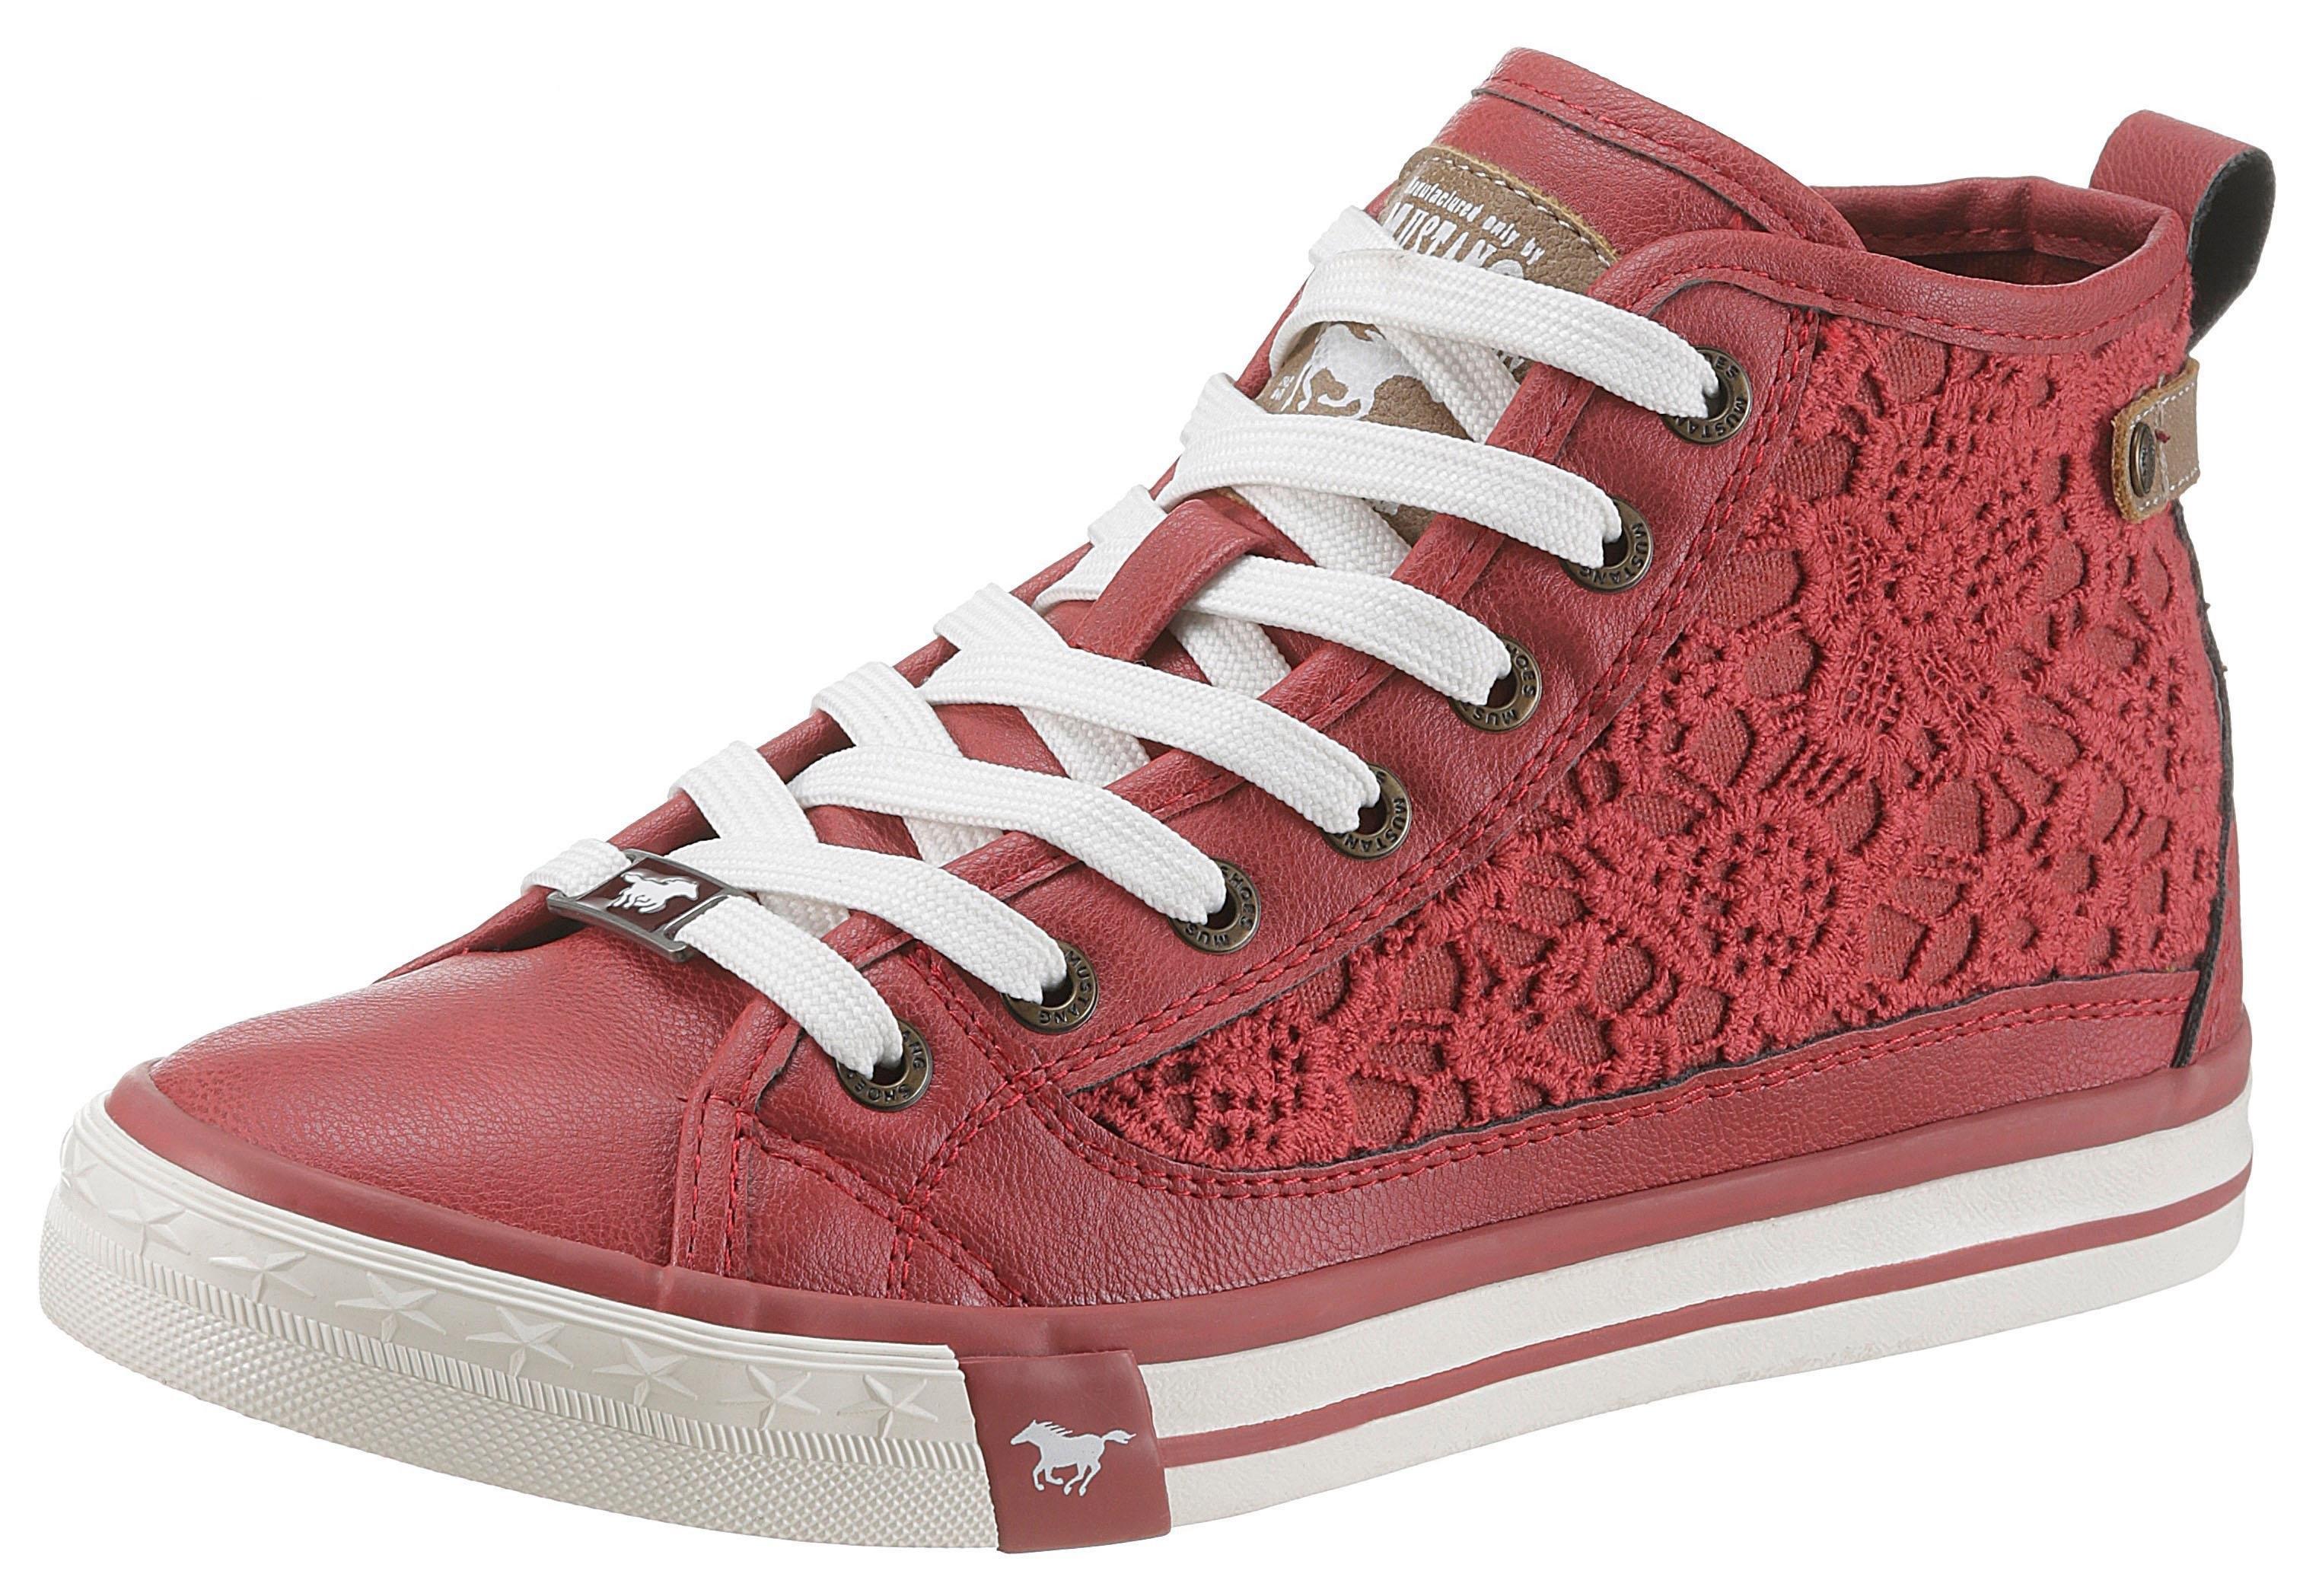 33dd4446b34 Hoge sneakers online bestellen? Shop ze online | OTTO